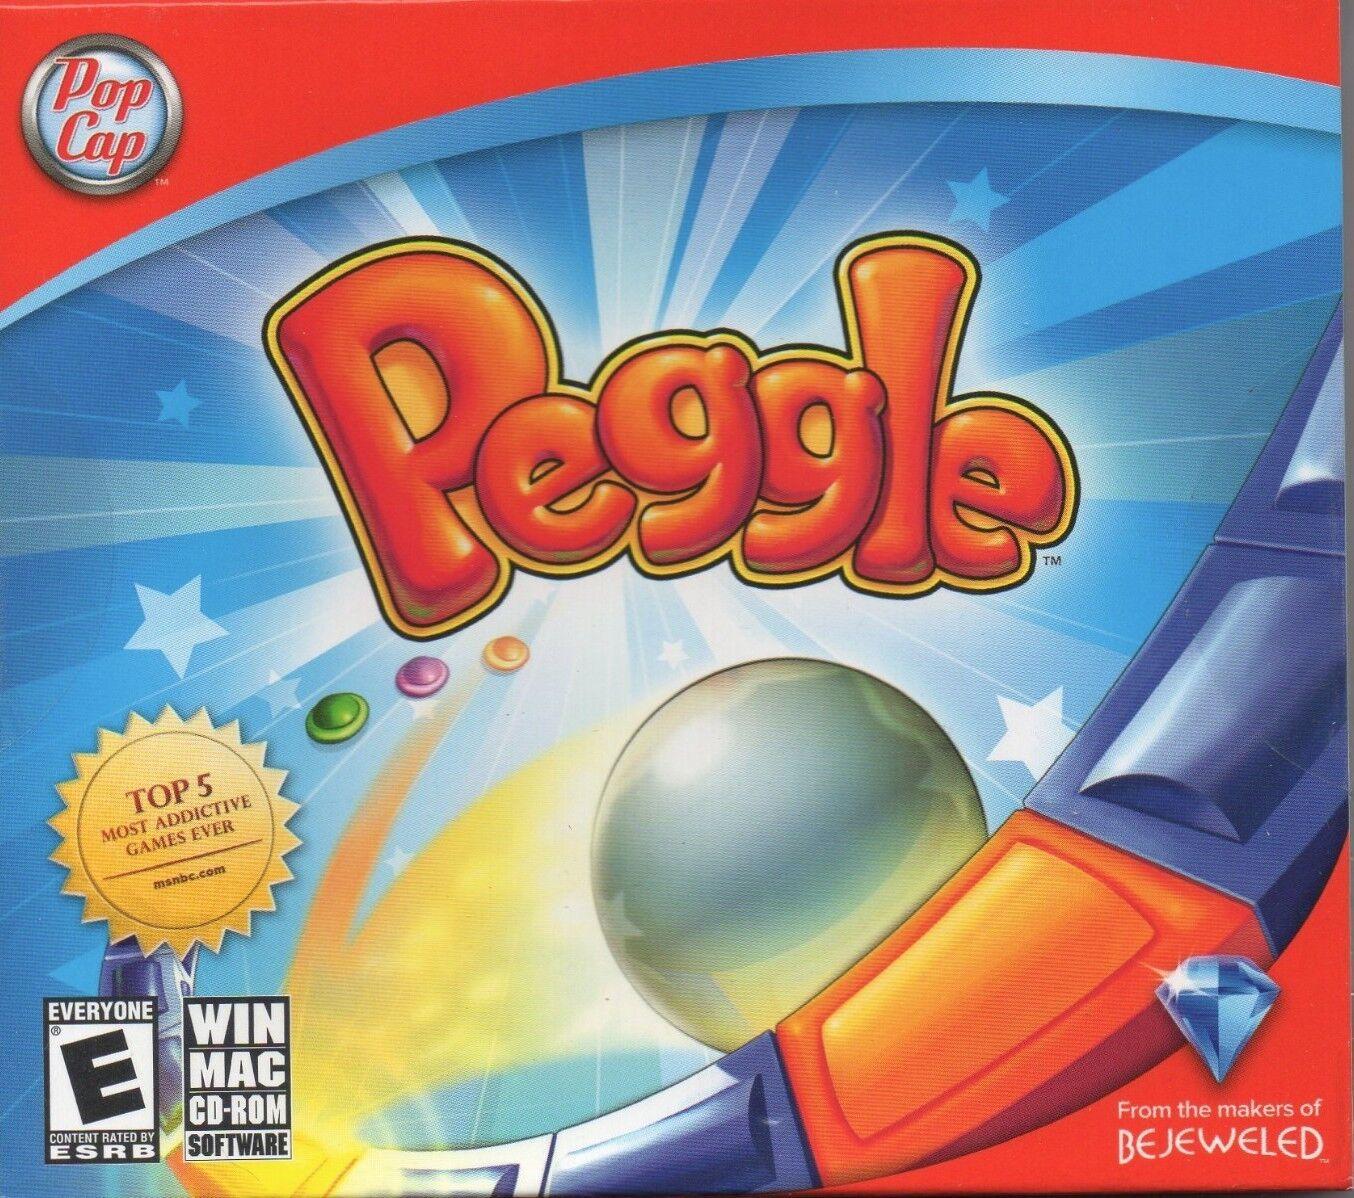 Computer Games - Peggle PC Games Windows 10 8 7 XP Computer pop cap popcap puzzle pachinko NEW